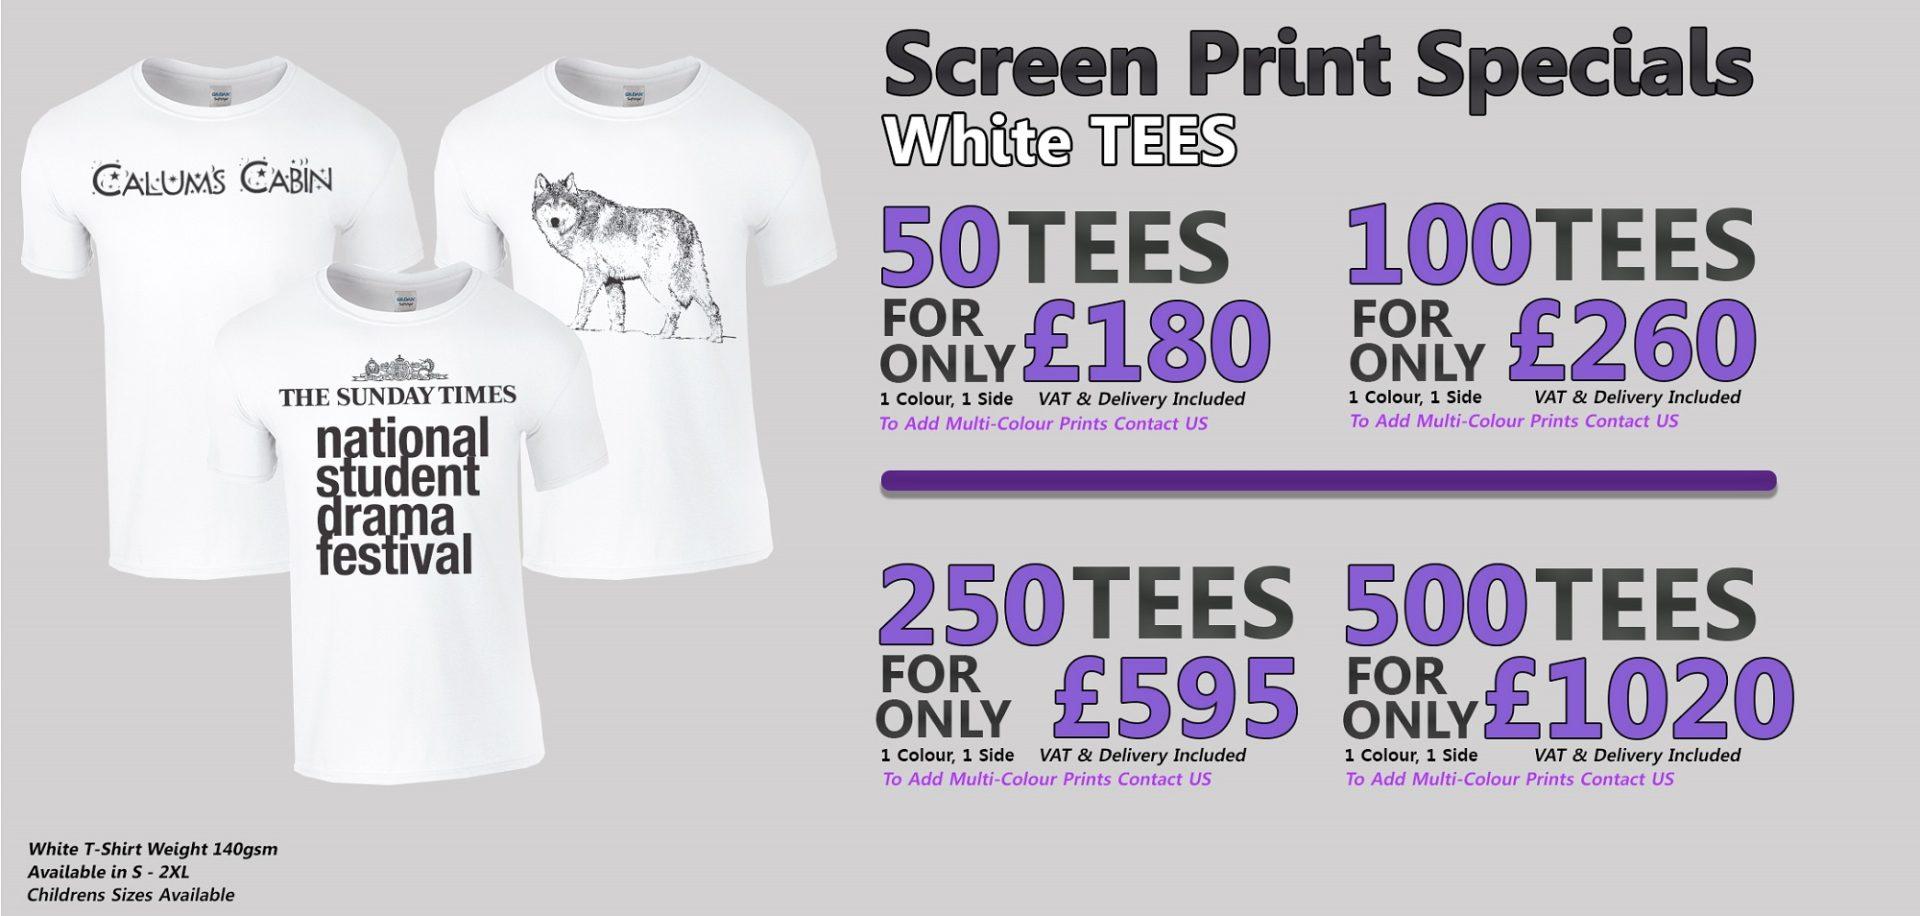 White T-shirt Screen Printing Offer